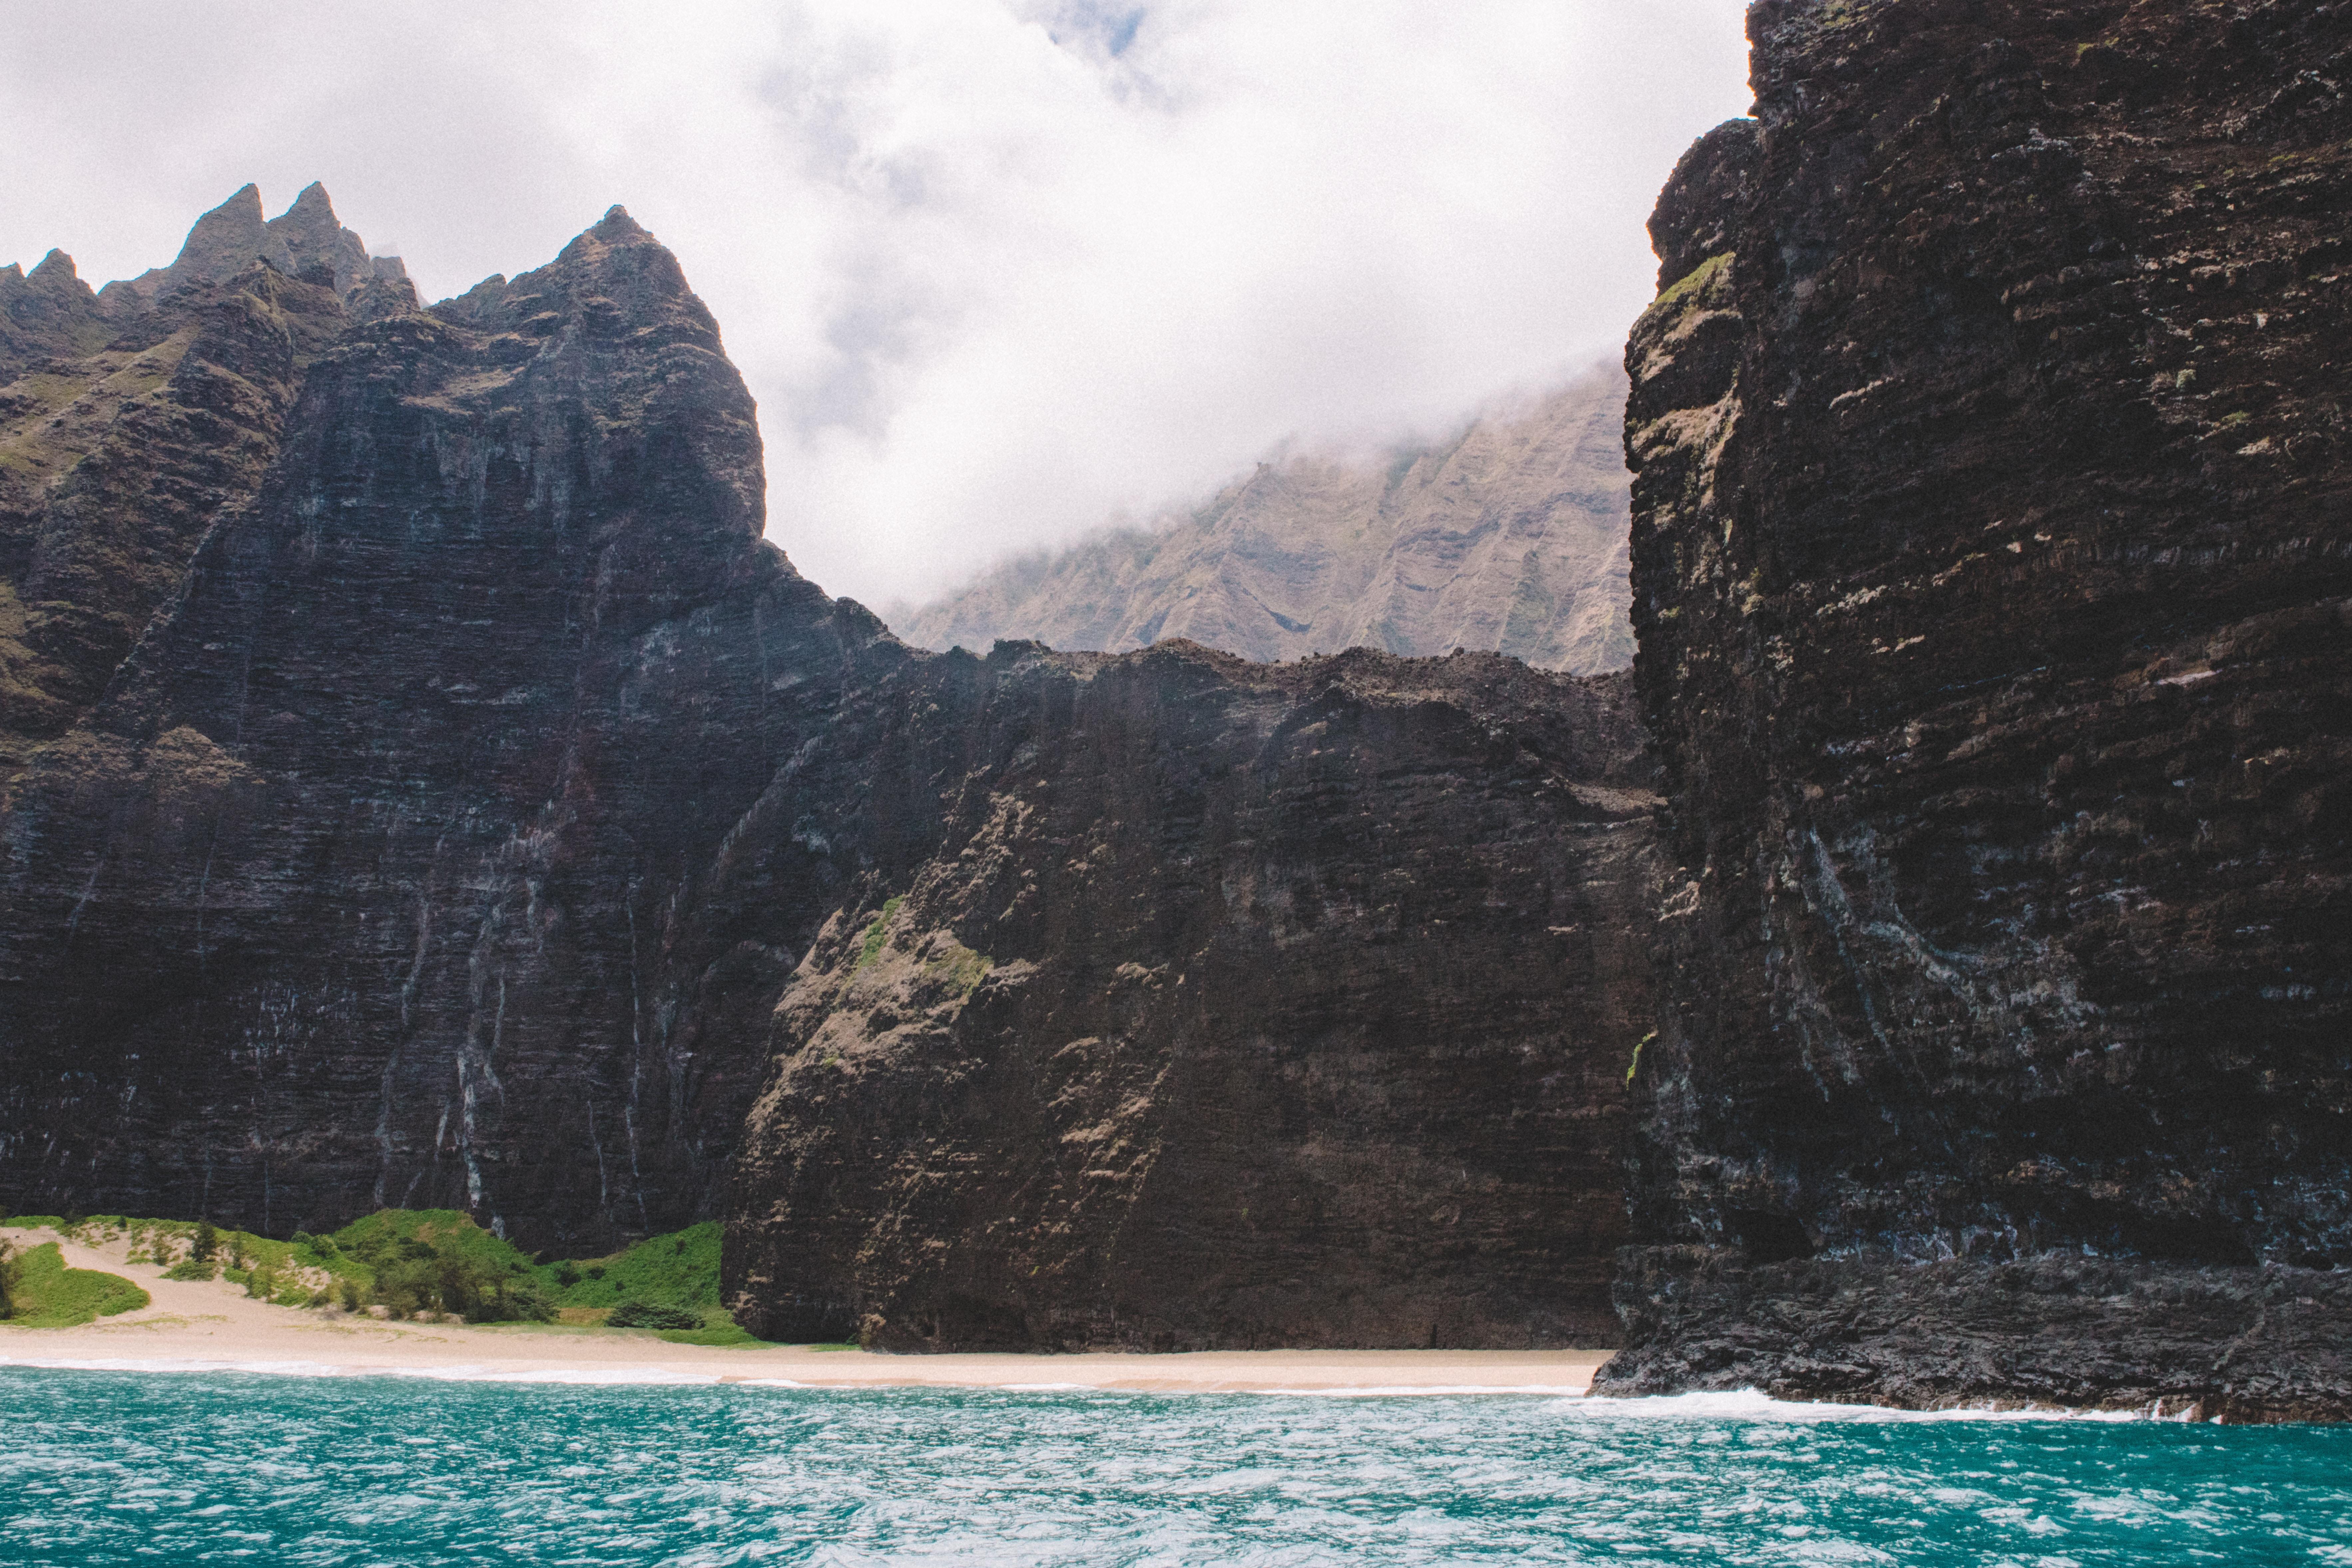 cliff beside body of water